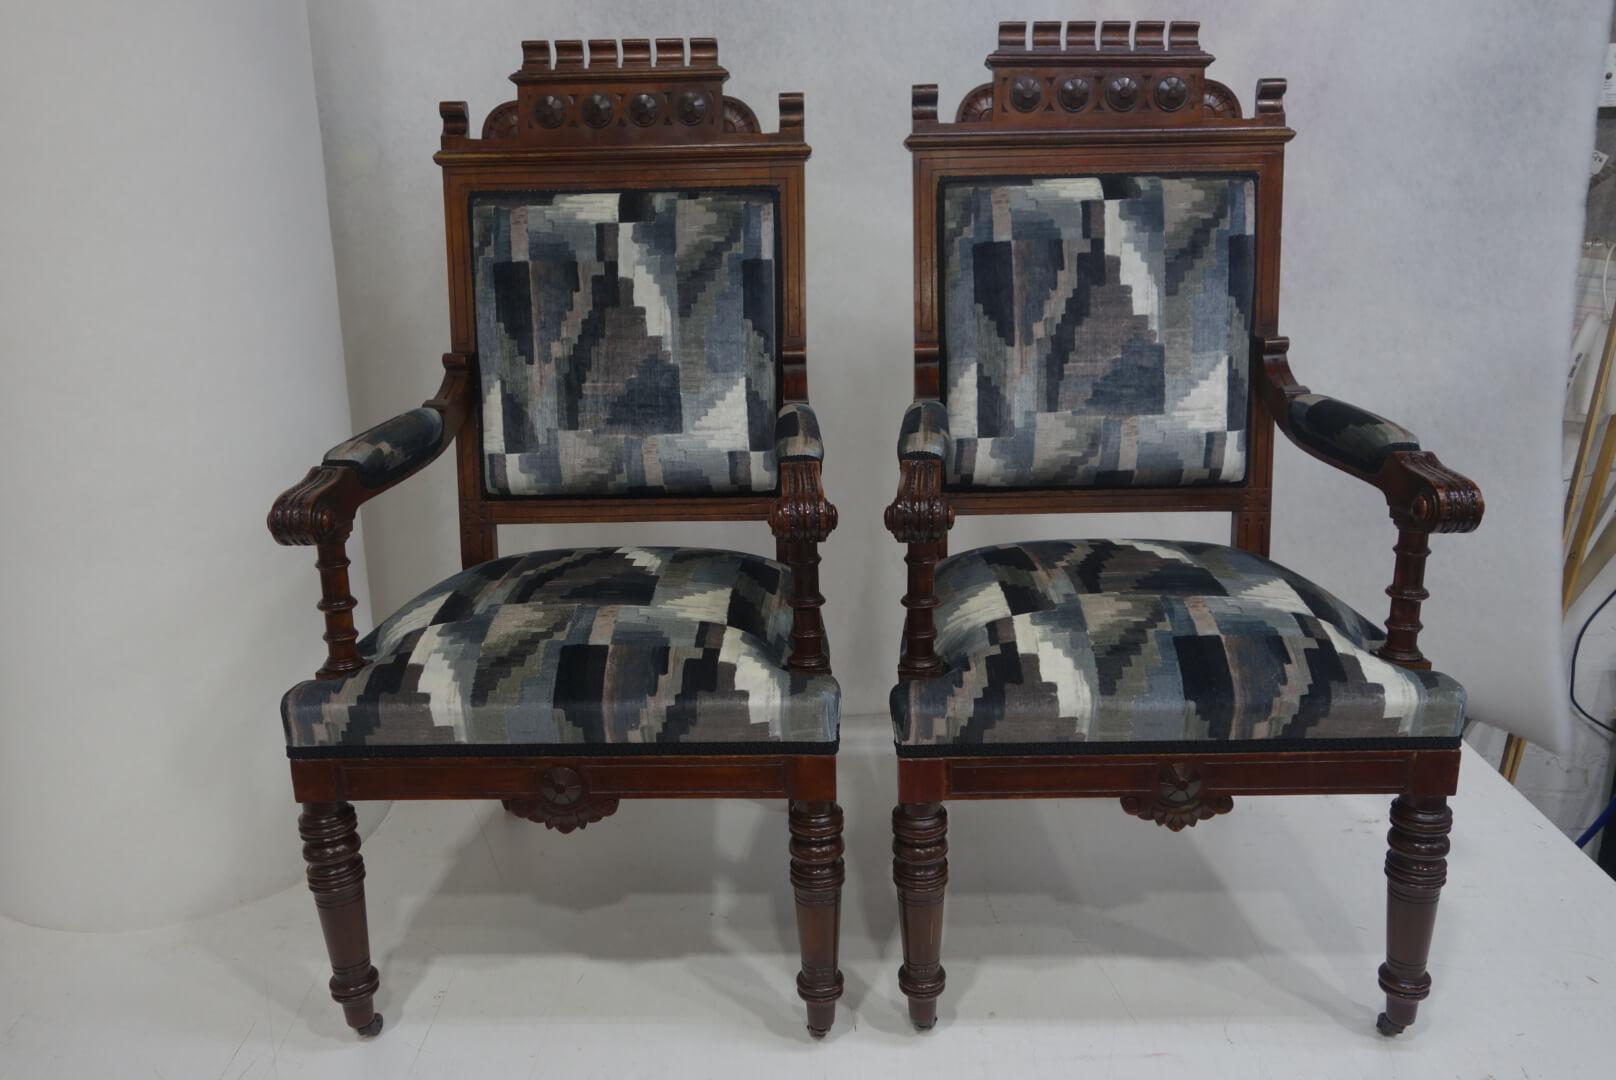 edwardian-chairs